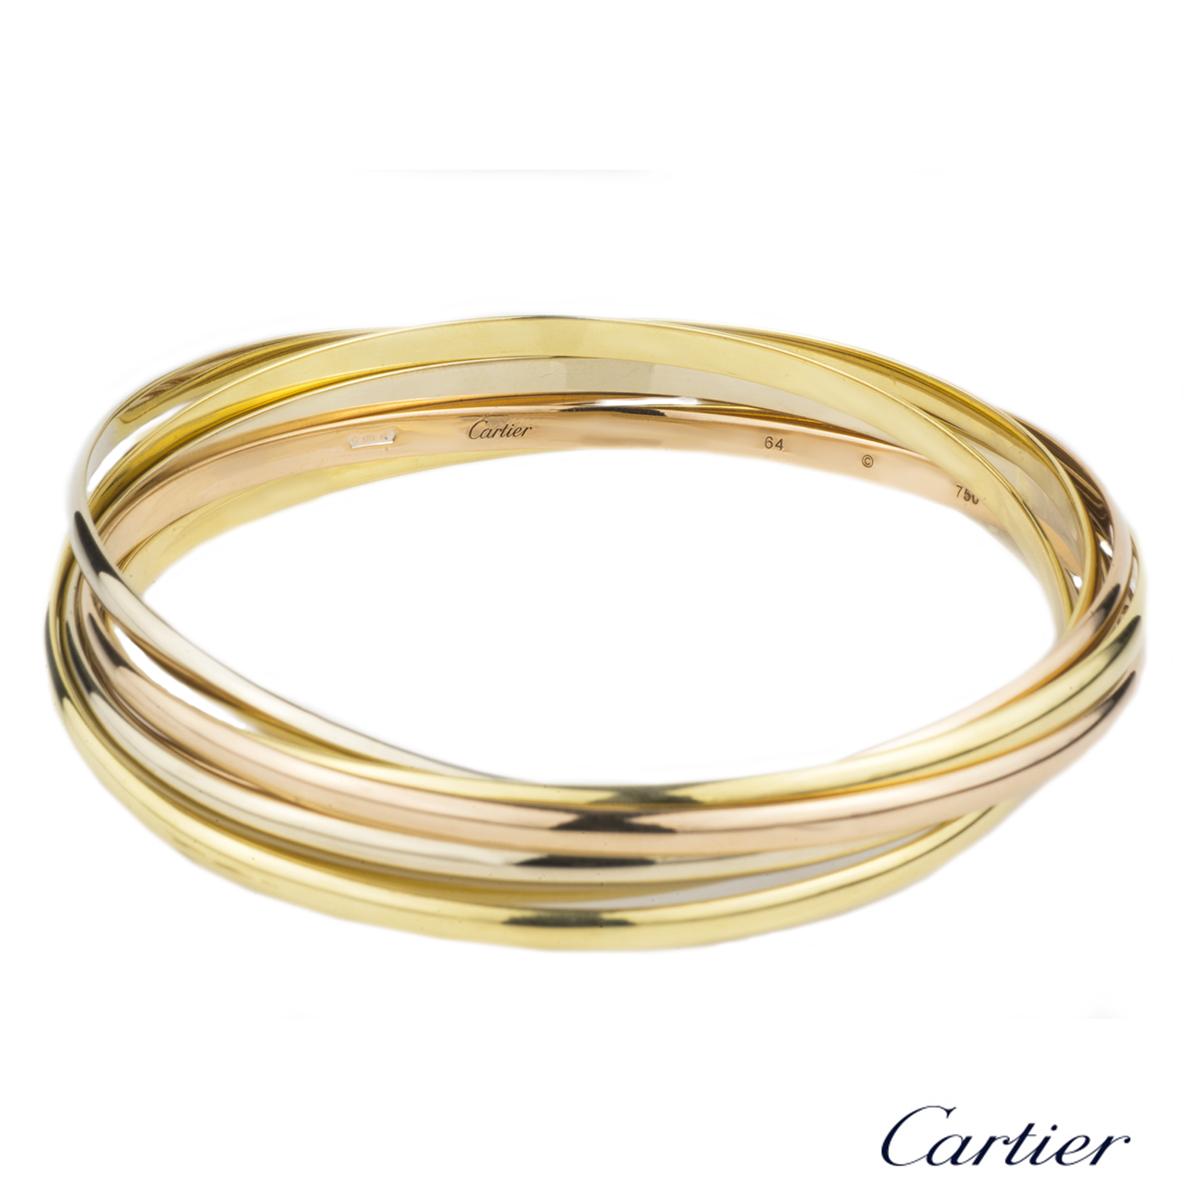 Cartier Infinity Bracelet: Cartier 18k Three Colour Gold Trinity Bracelet